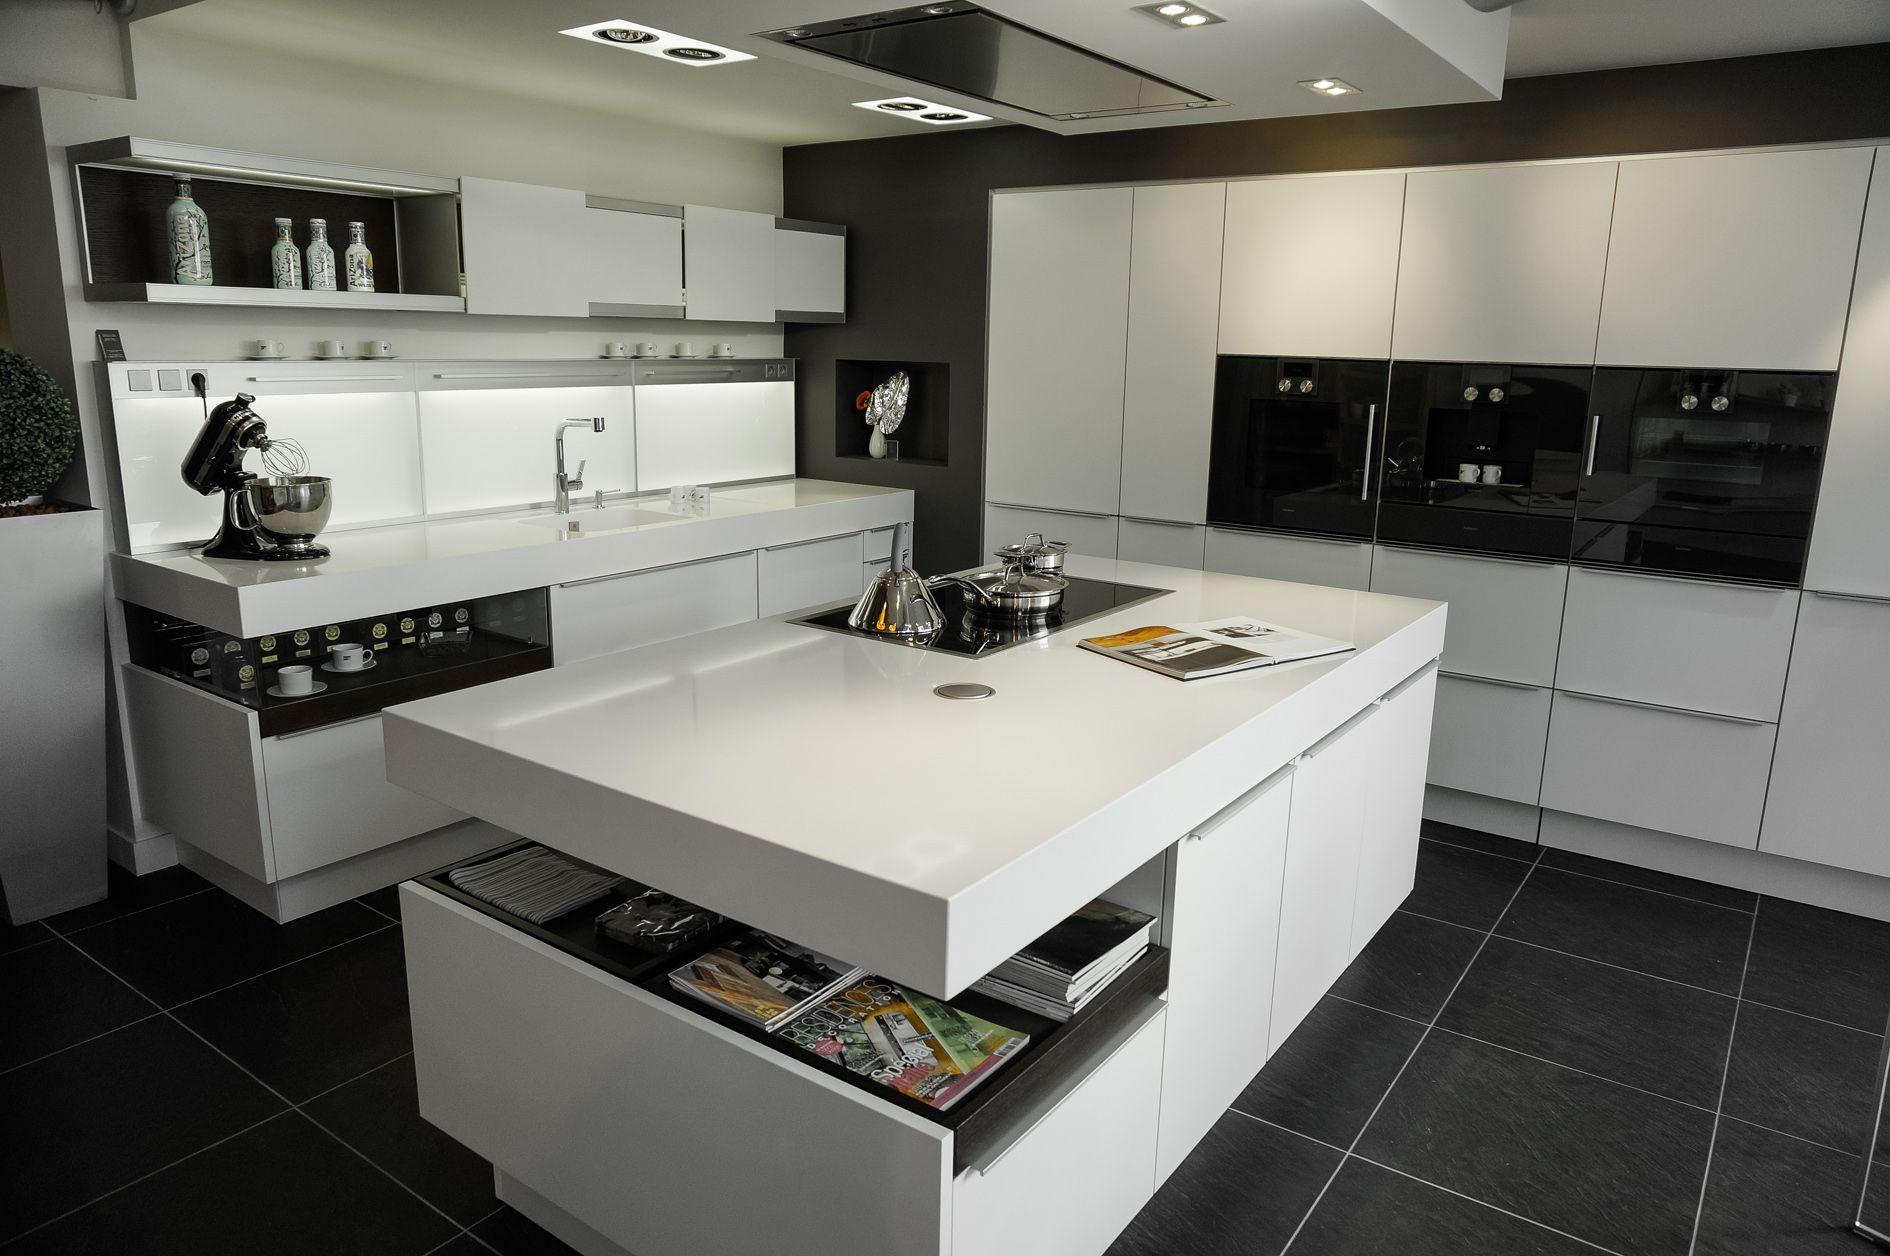 cuisine dekton recherche google cuisine pinterest. Black Bedroom Furniture Sets. Home Design Ideas